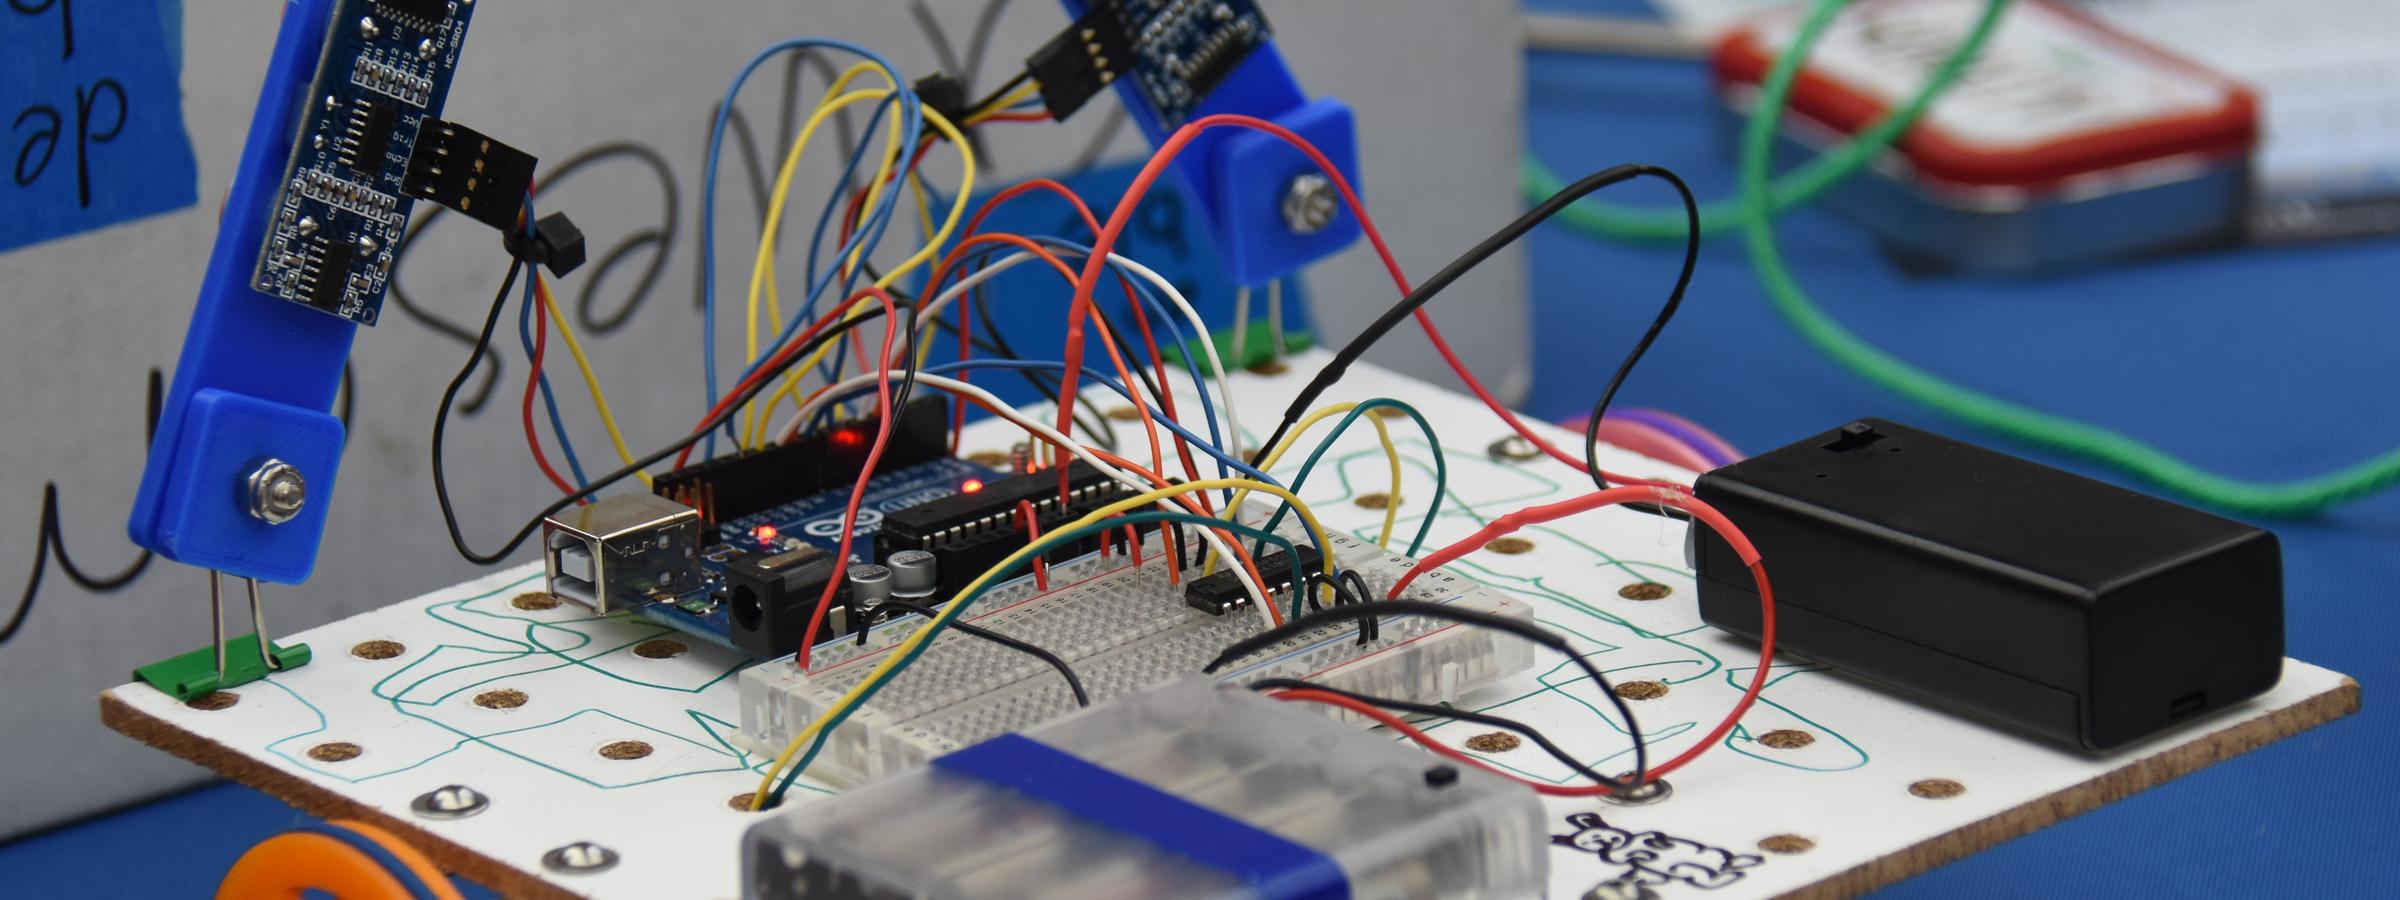 Robotics Wires